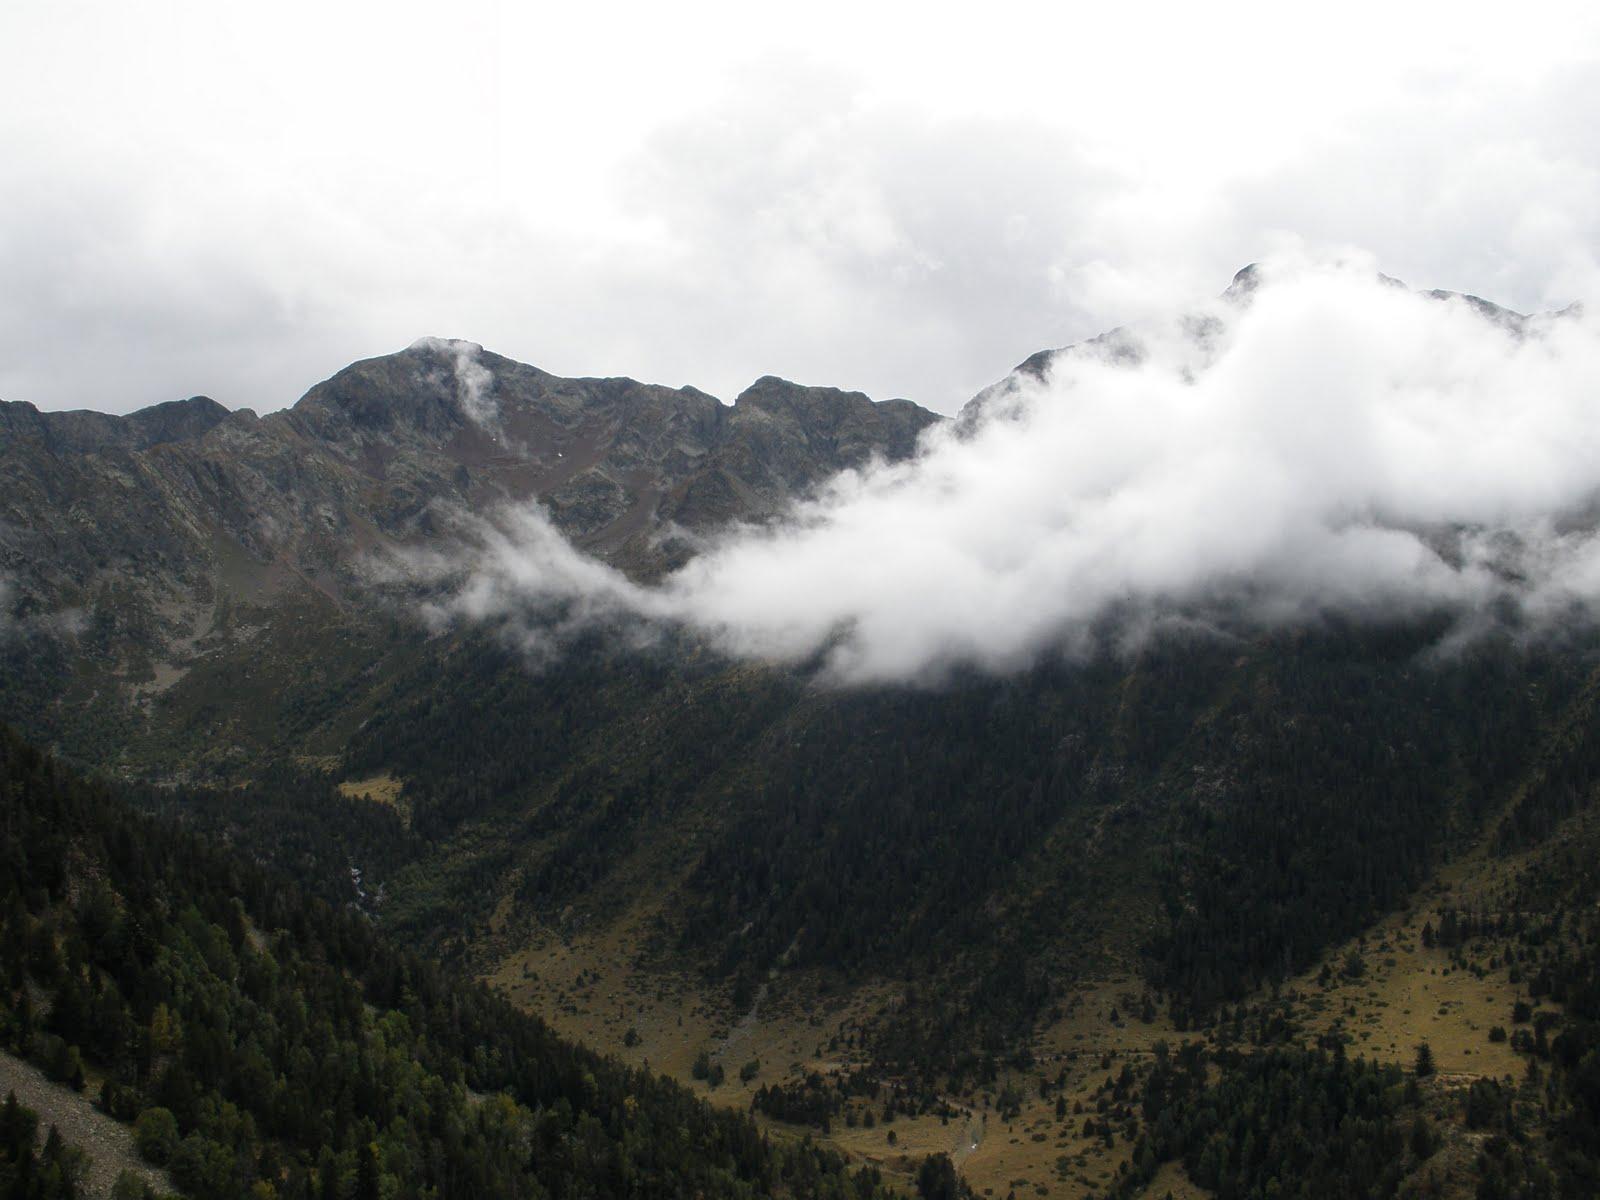 Buena perspectiva del valle